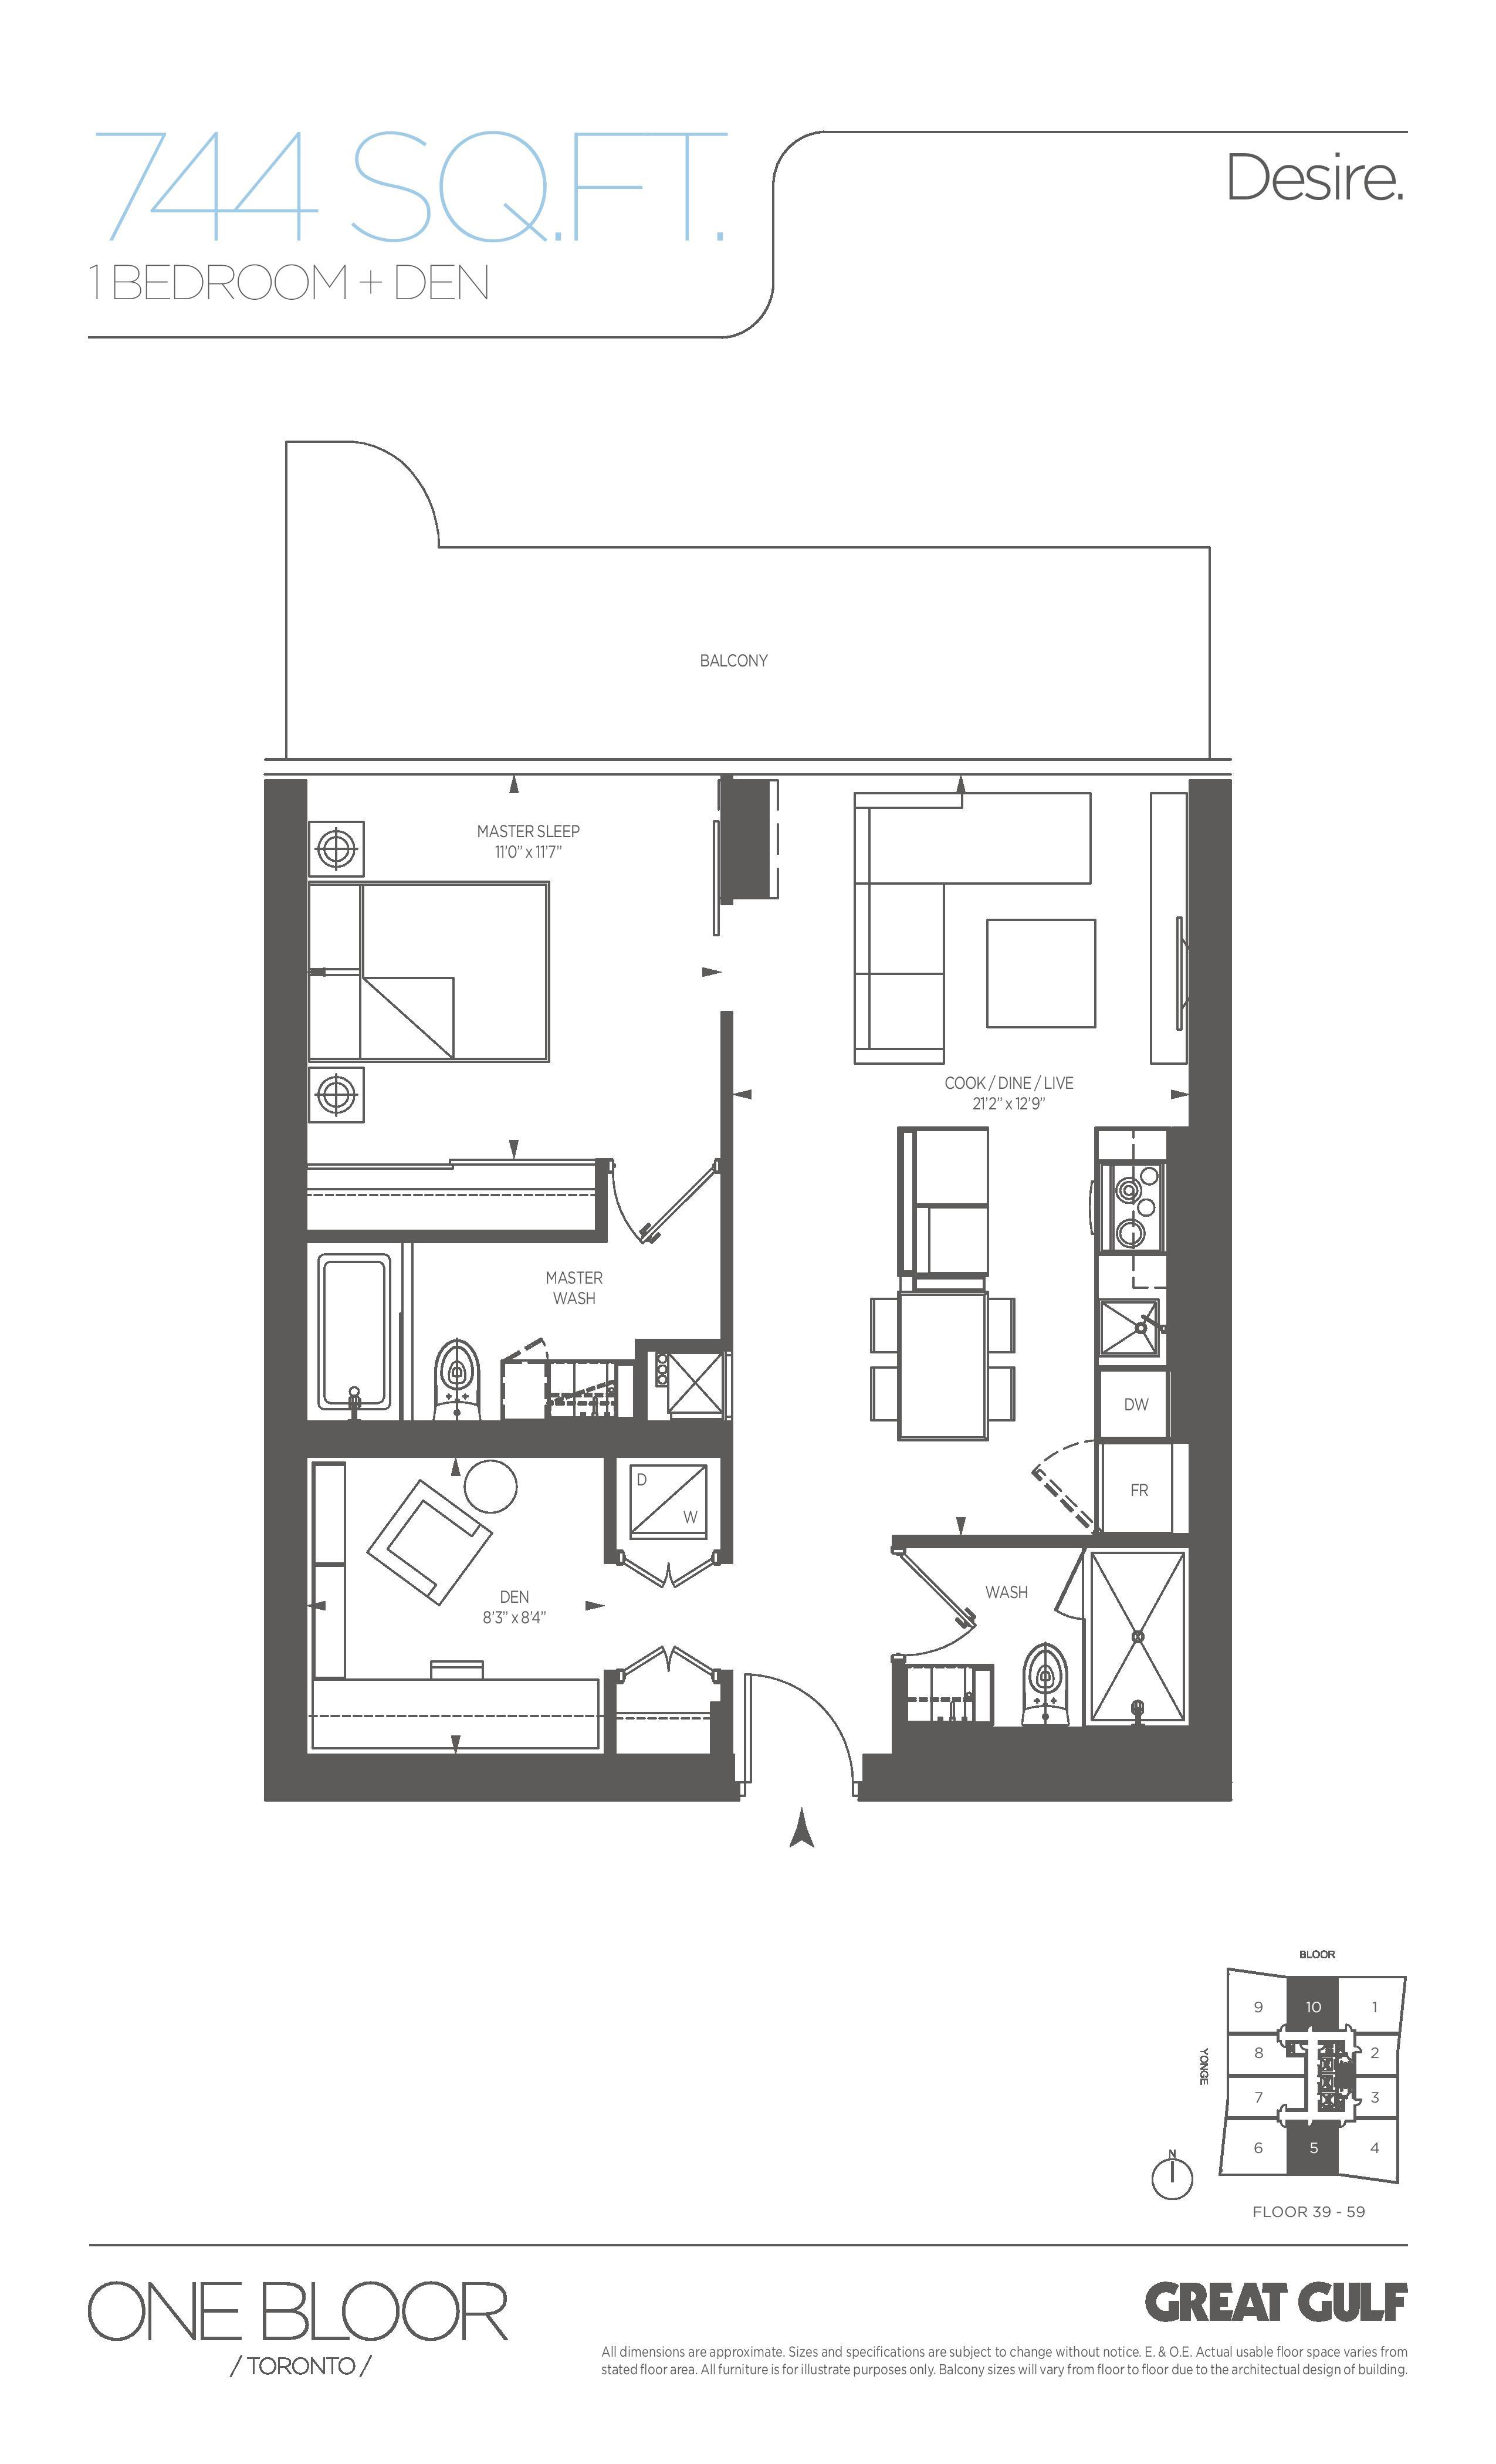 Desire Floor Plan at One Bloor Condos - 744 sq.ft